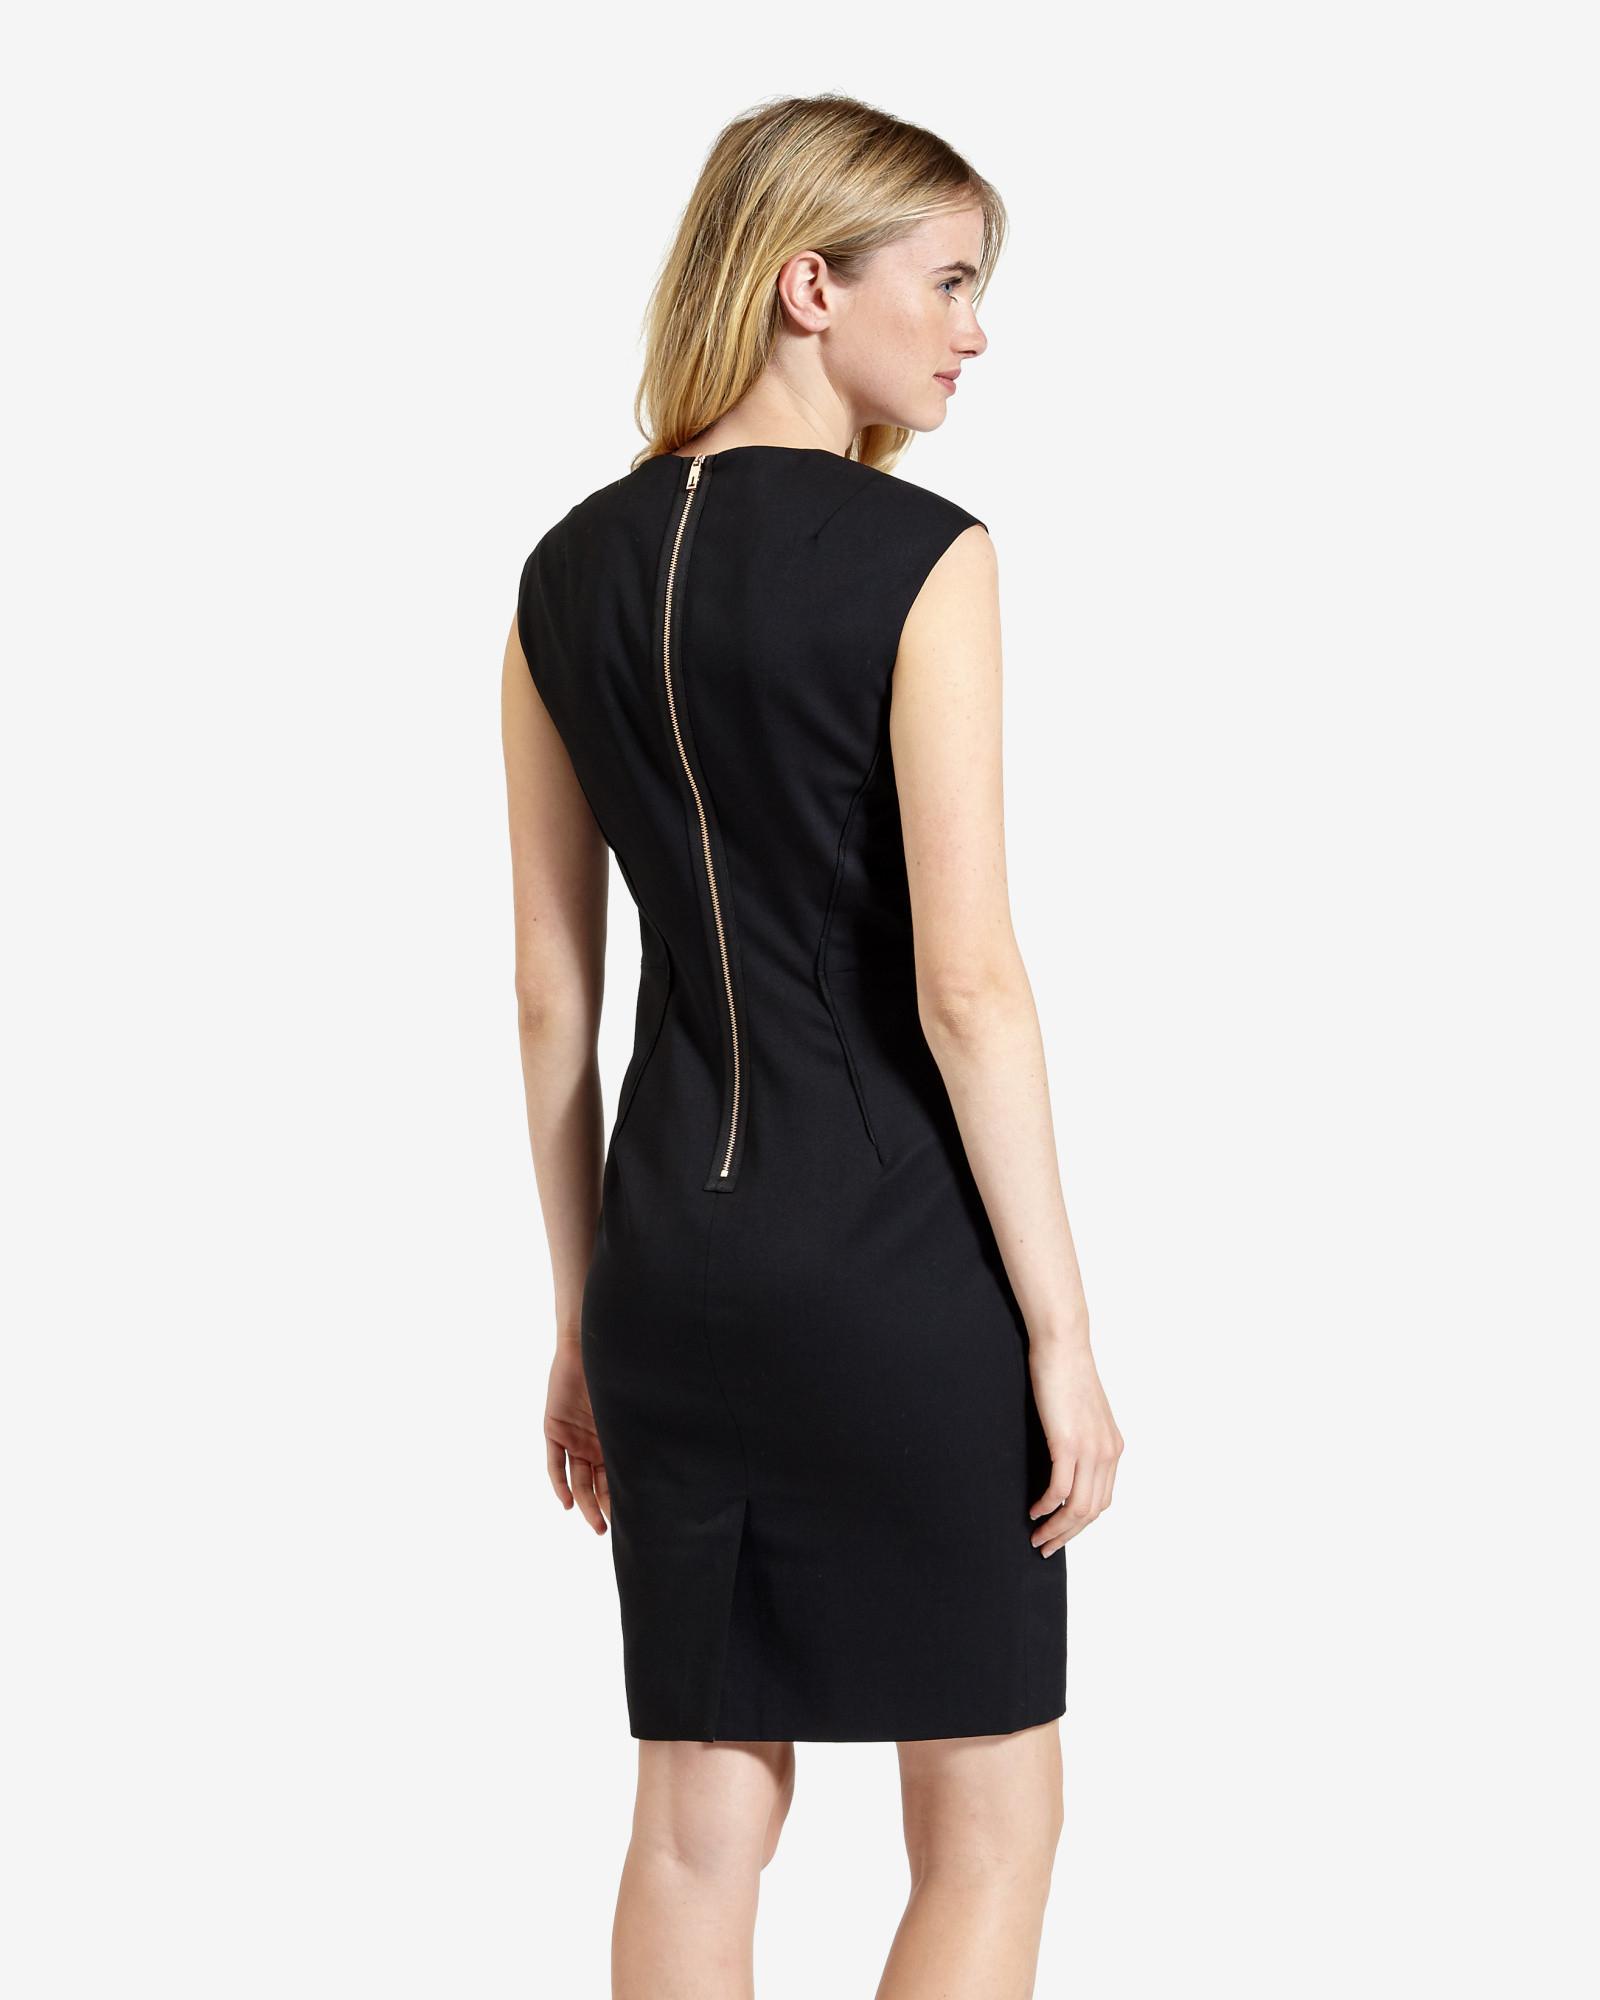 Ted baker Suit Dress in Black | Lyst